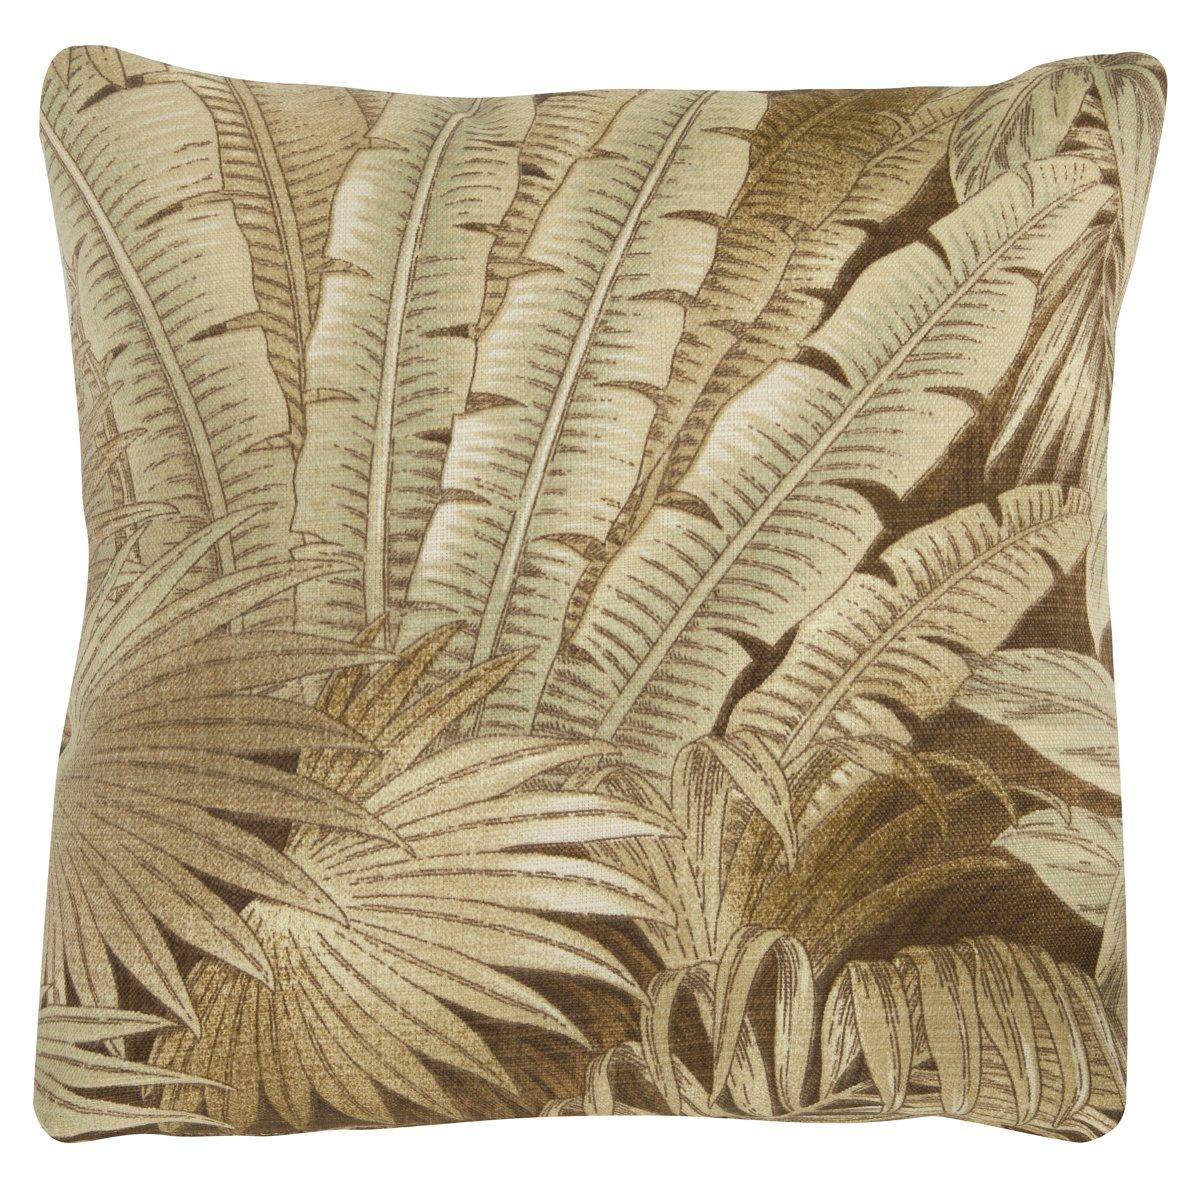 "Bree Multicolored 16"" Indoor/Outdoor Accent Pillow"